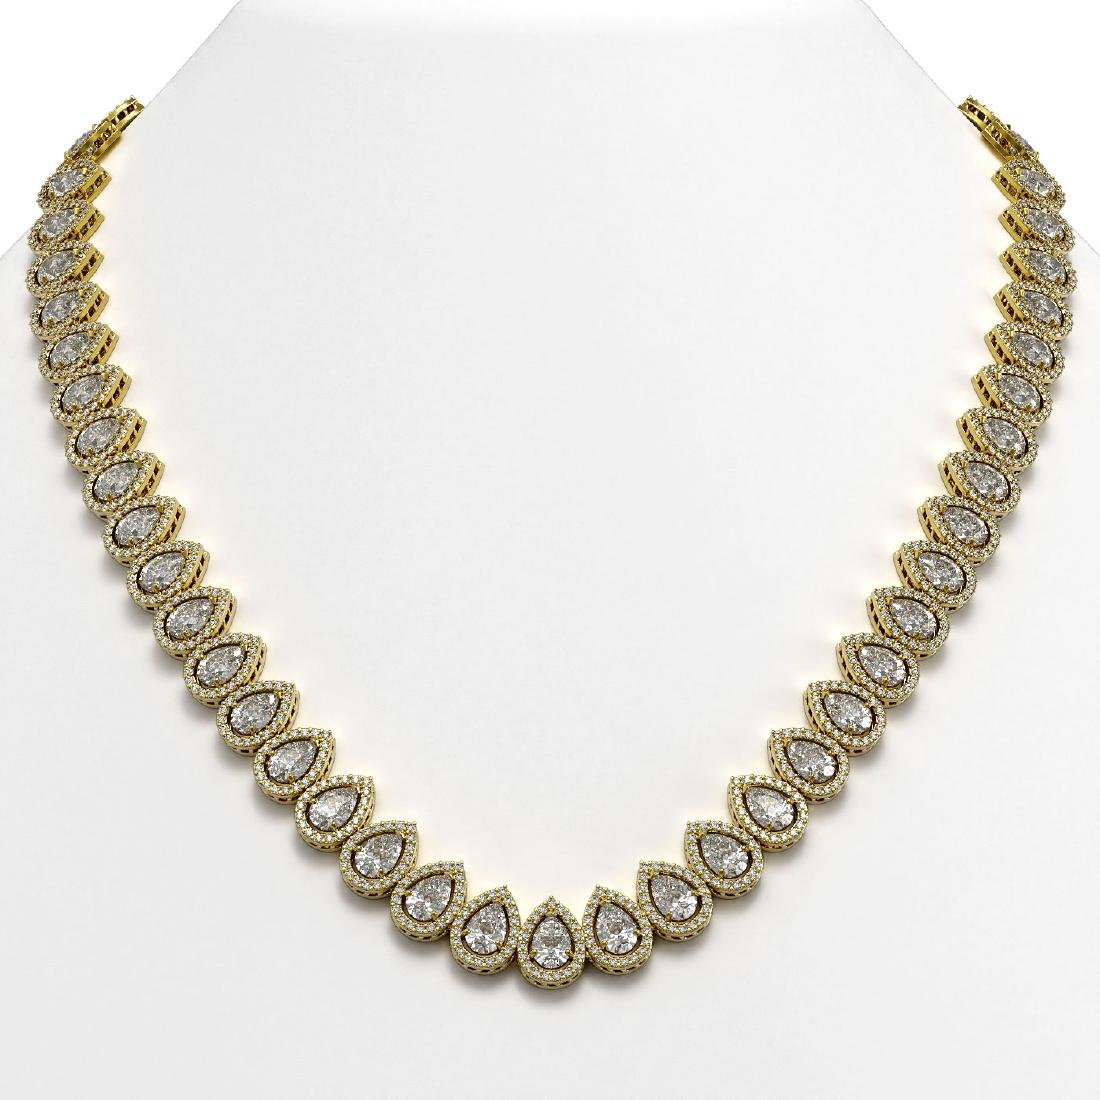 42.11 CTW Pear Diamond Designer Necklace 18K Yellow